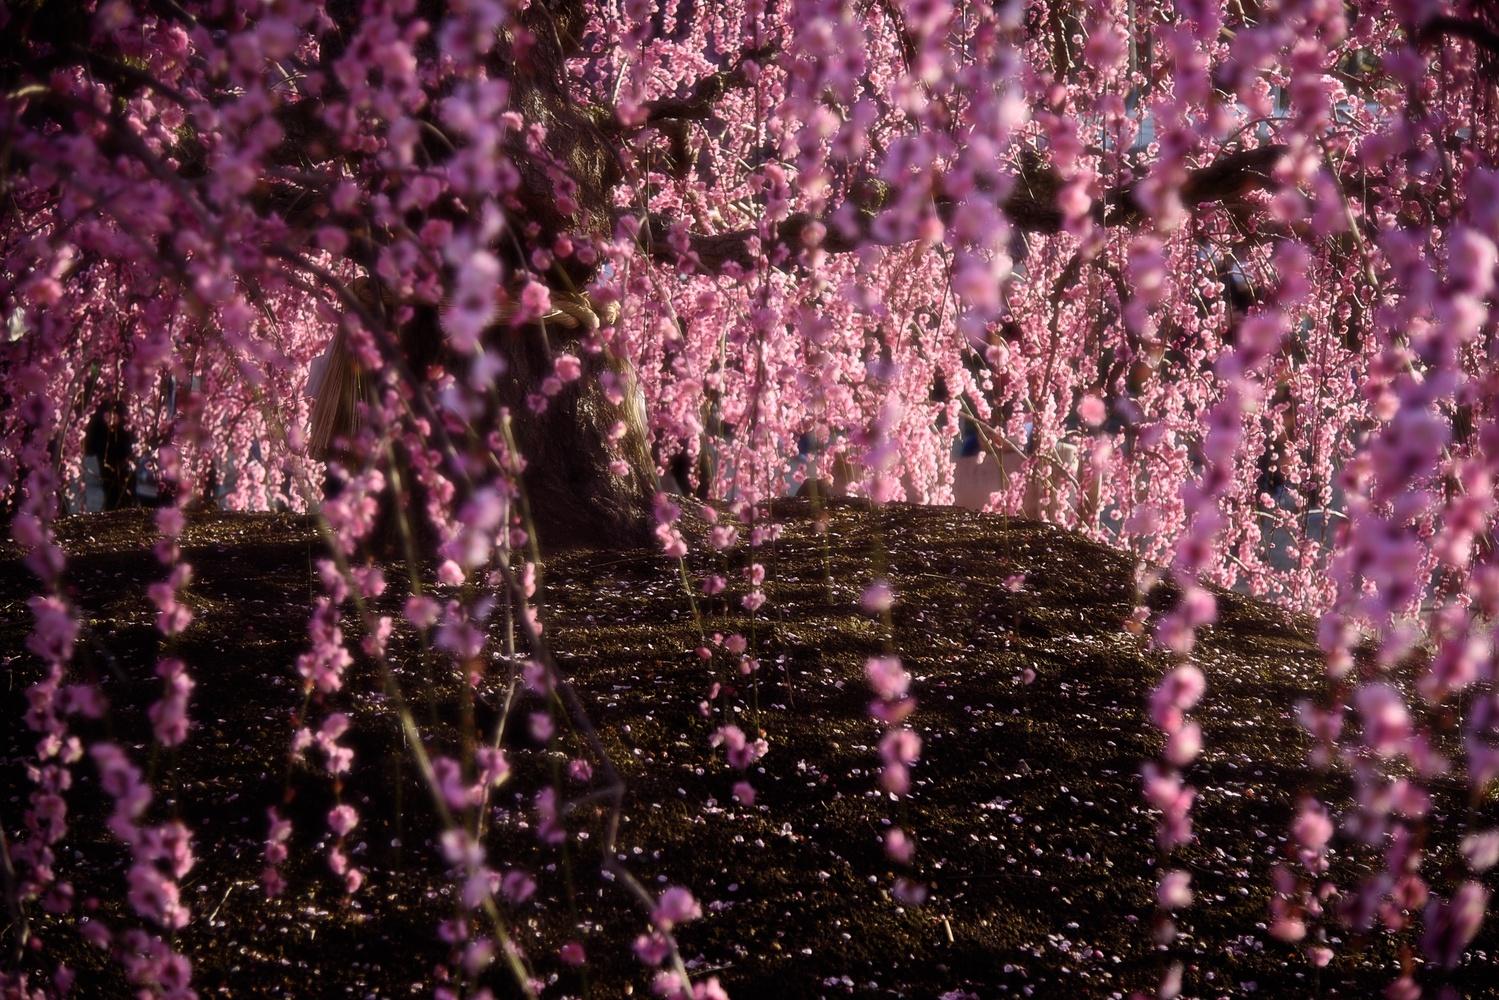 Plum flower shower by Masataka Inada